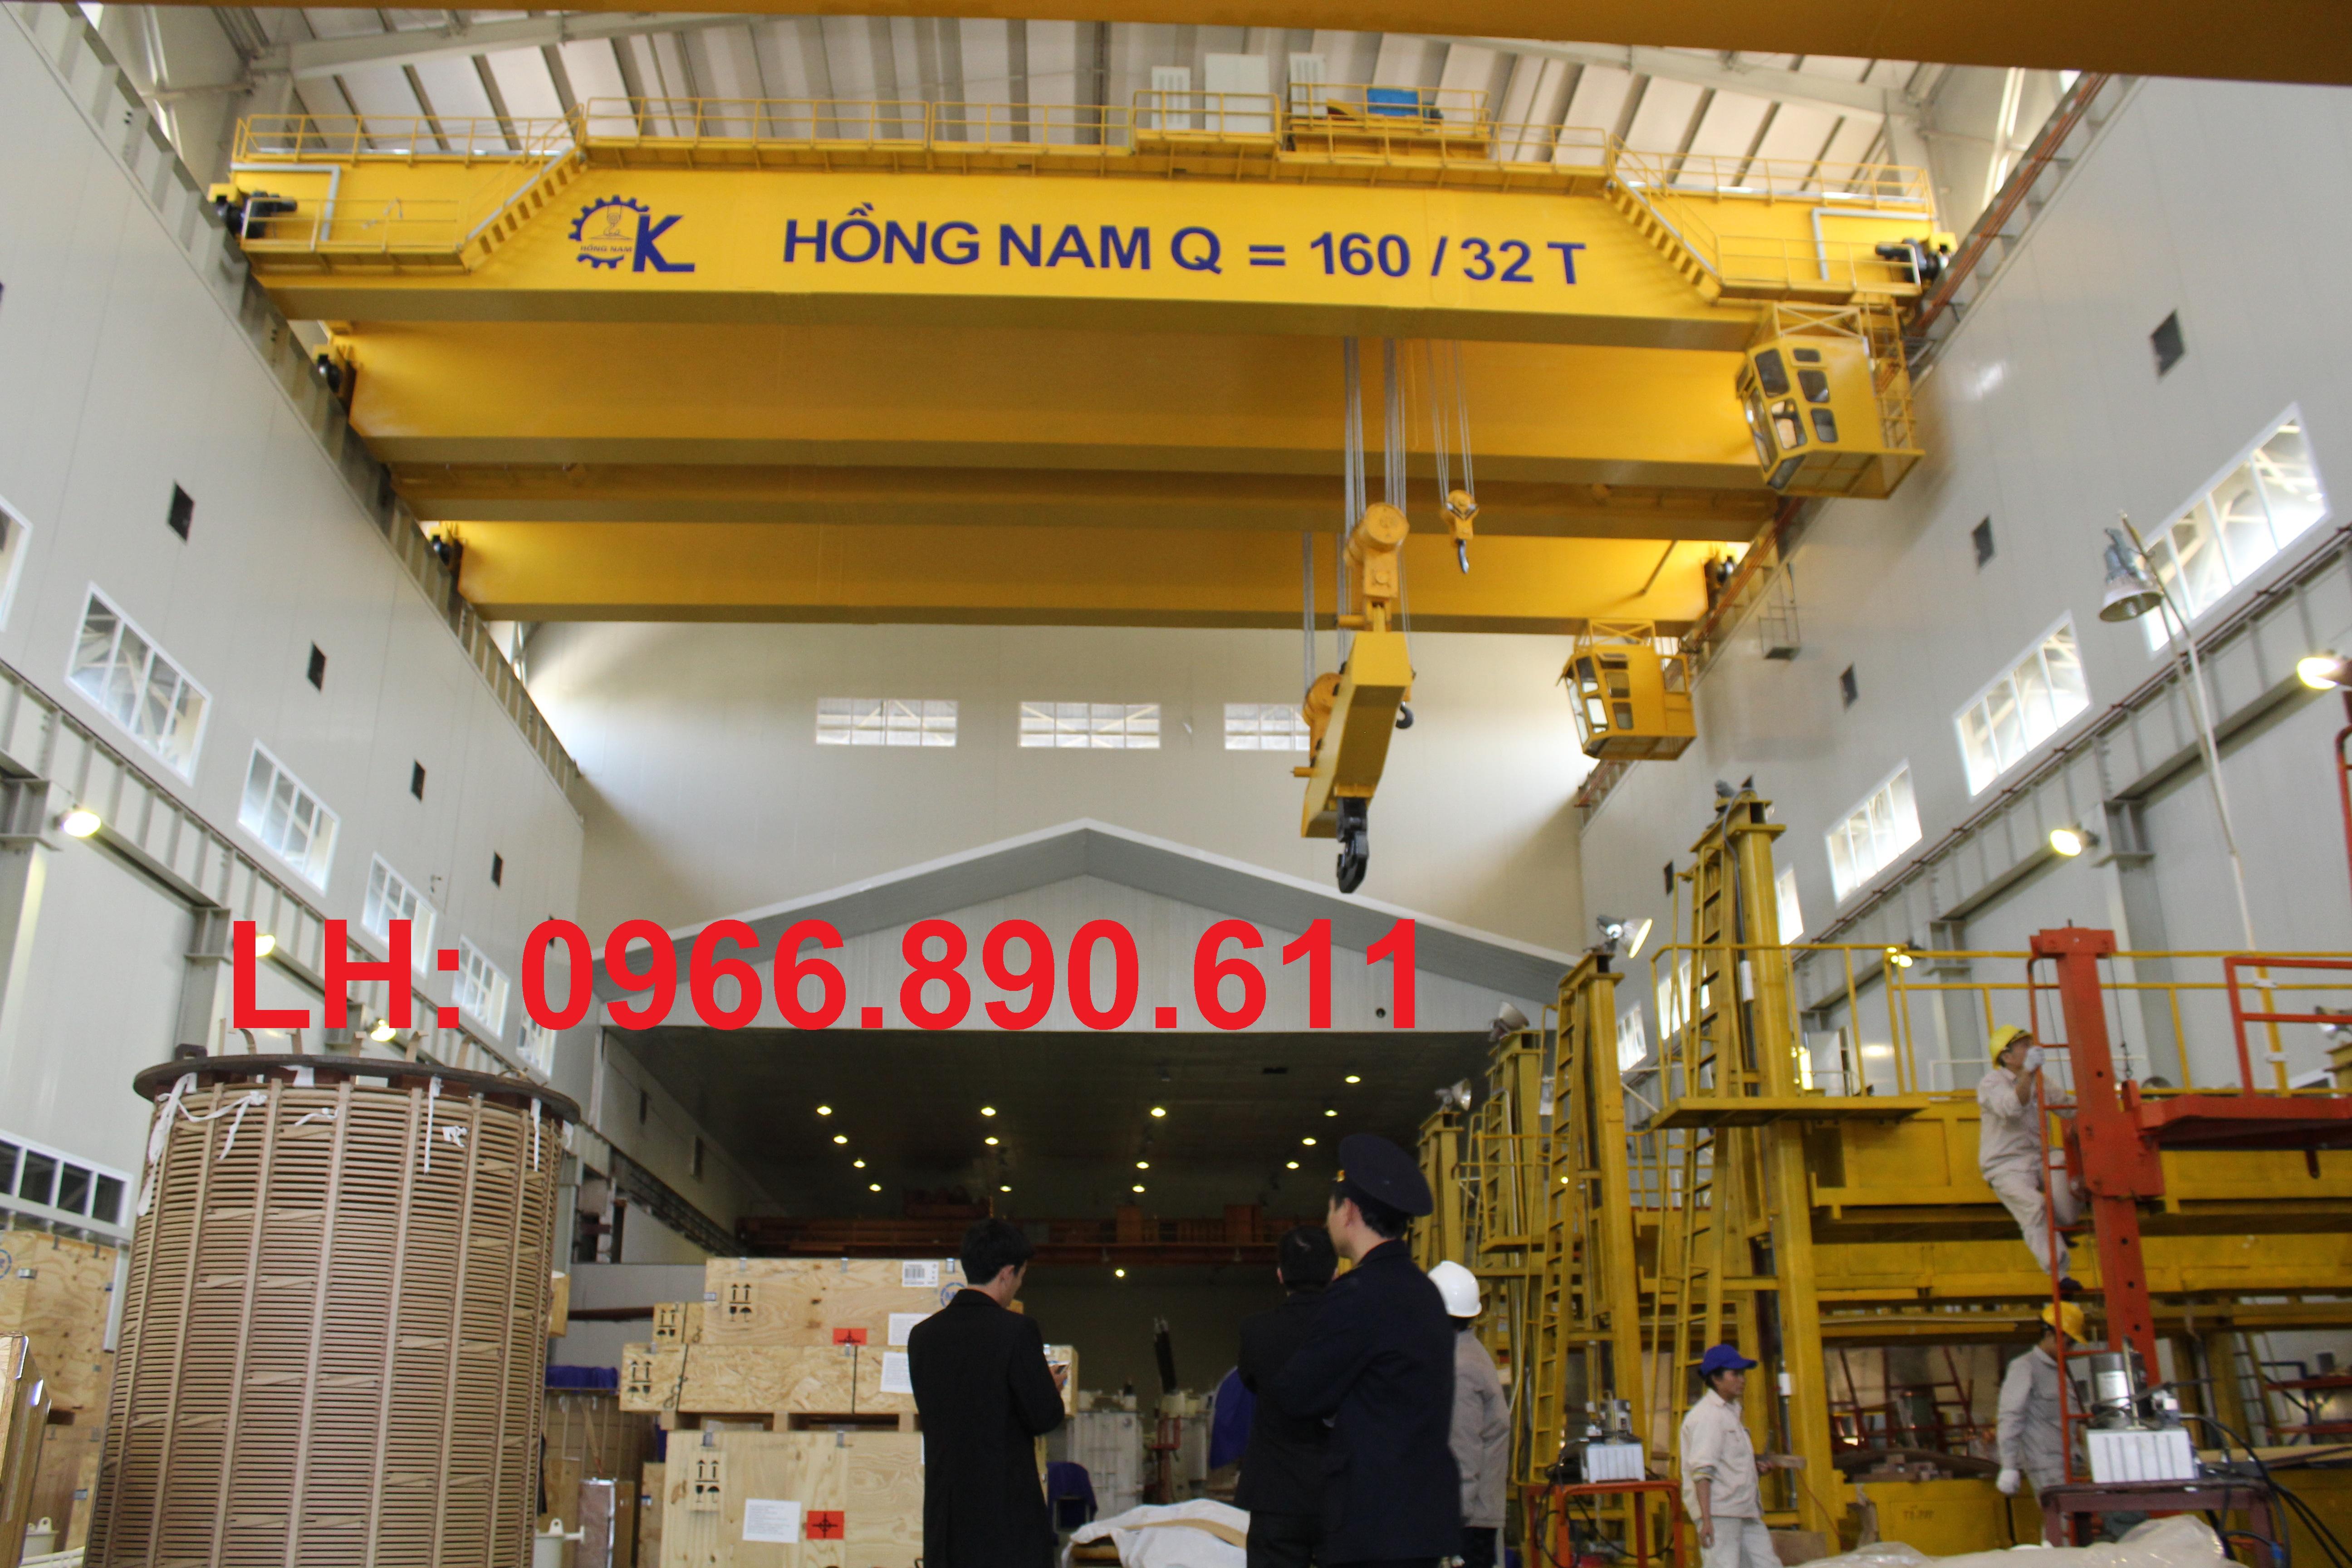 Cầu trục hai dầm 160/ 32 tấn